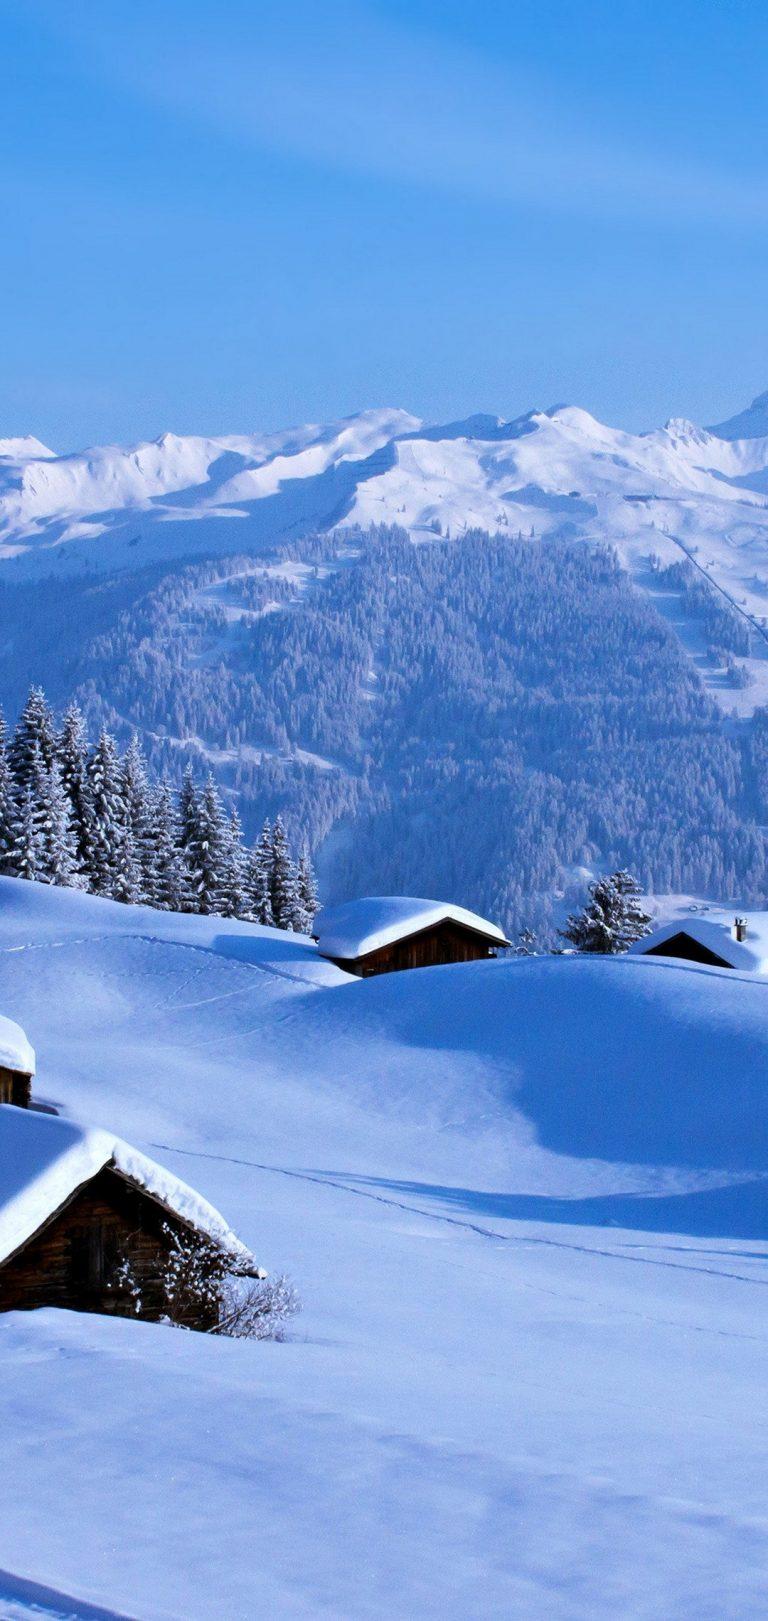 Winter Snow Wallpaper 1080x2280 768x1621